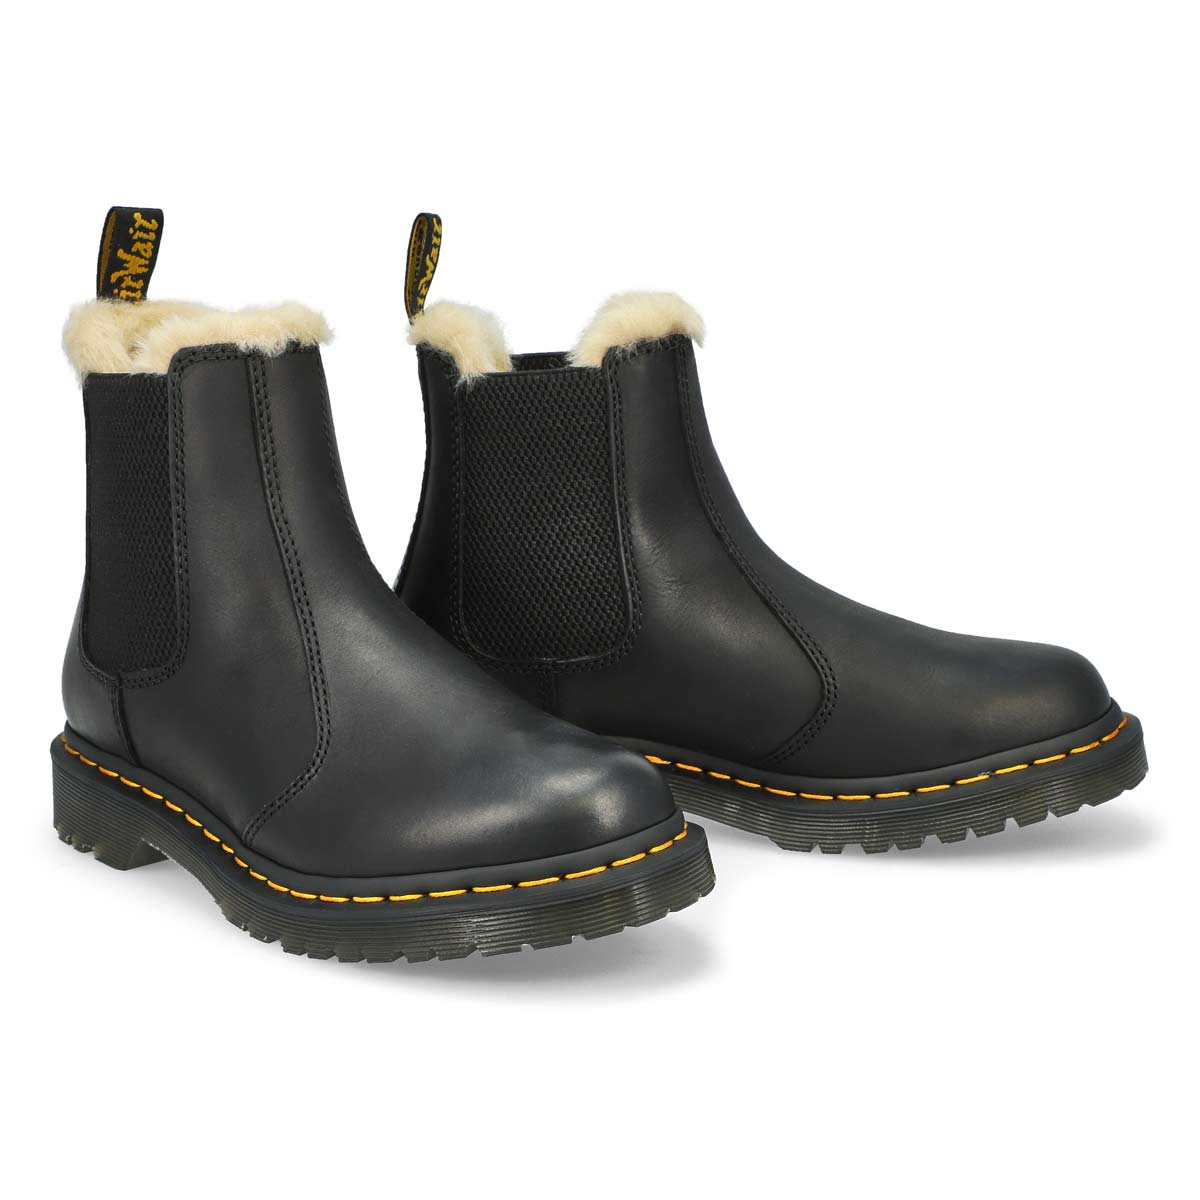 Women's 2976 Leonore Chelsea Boot - Black